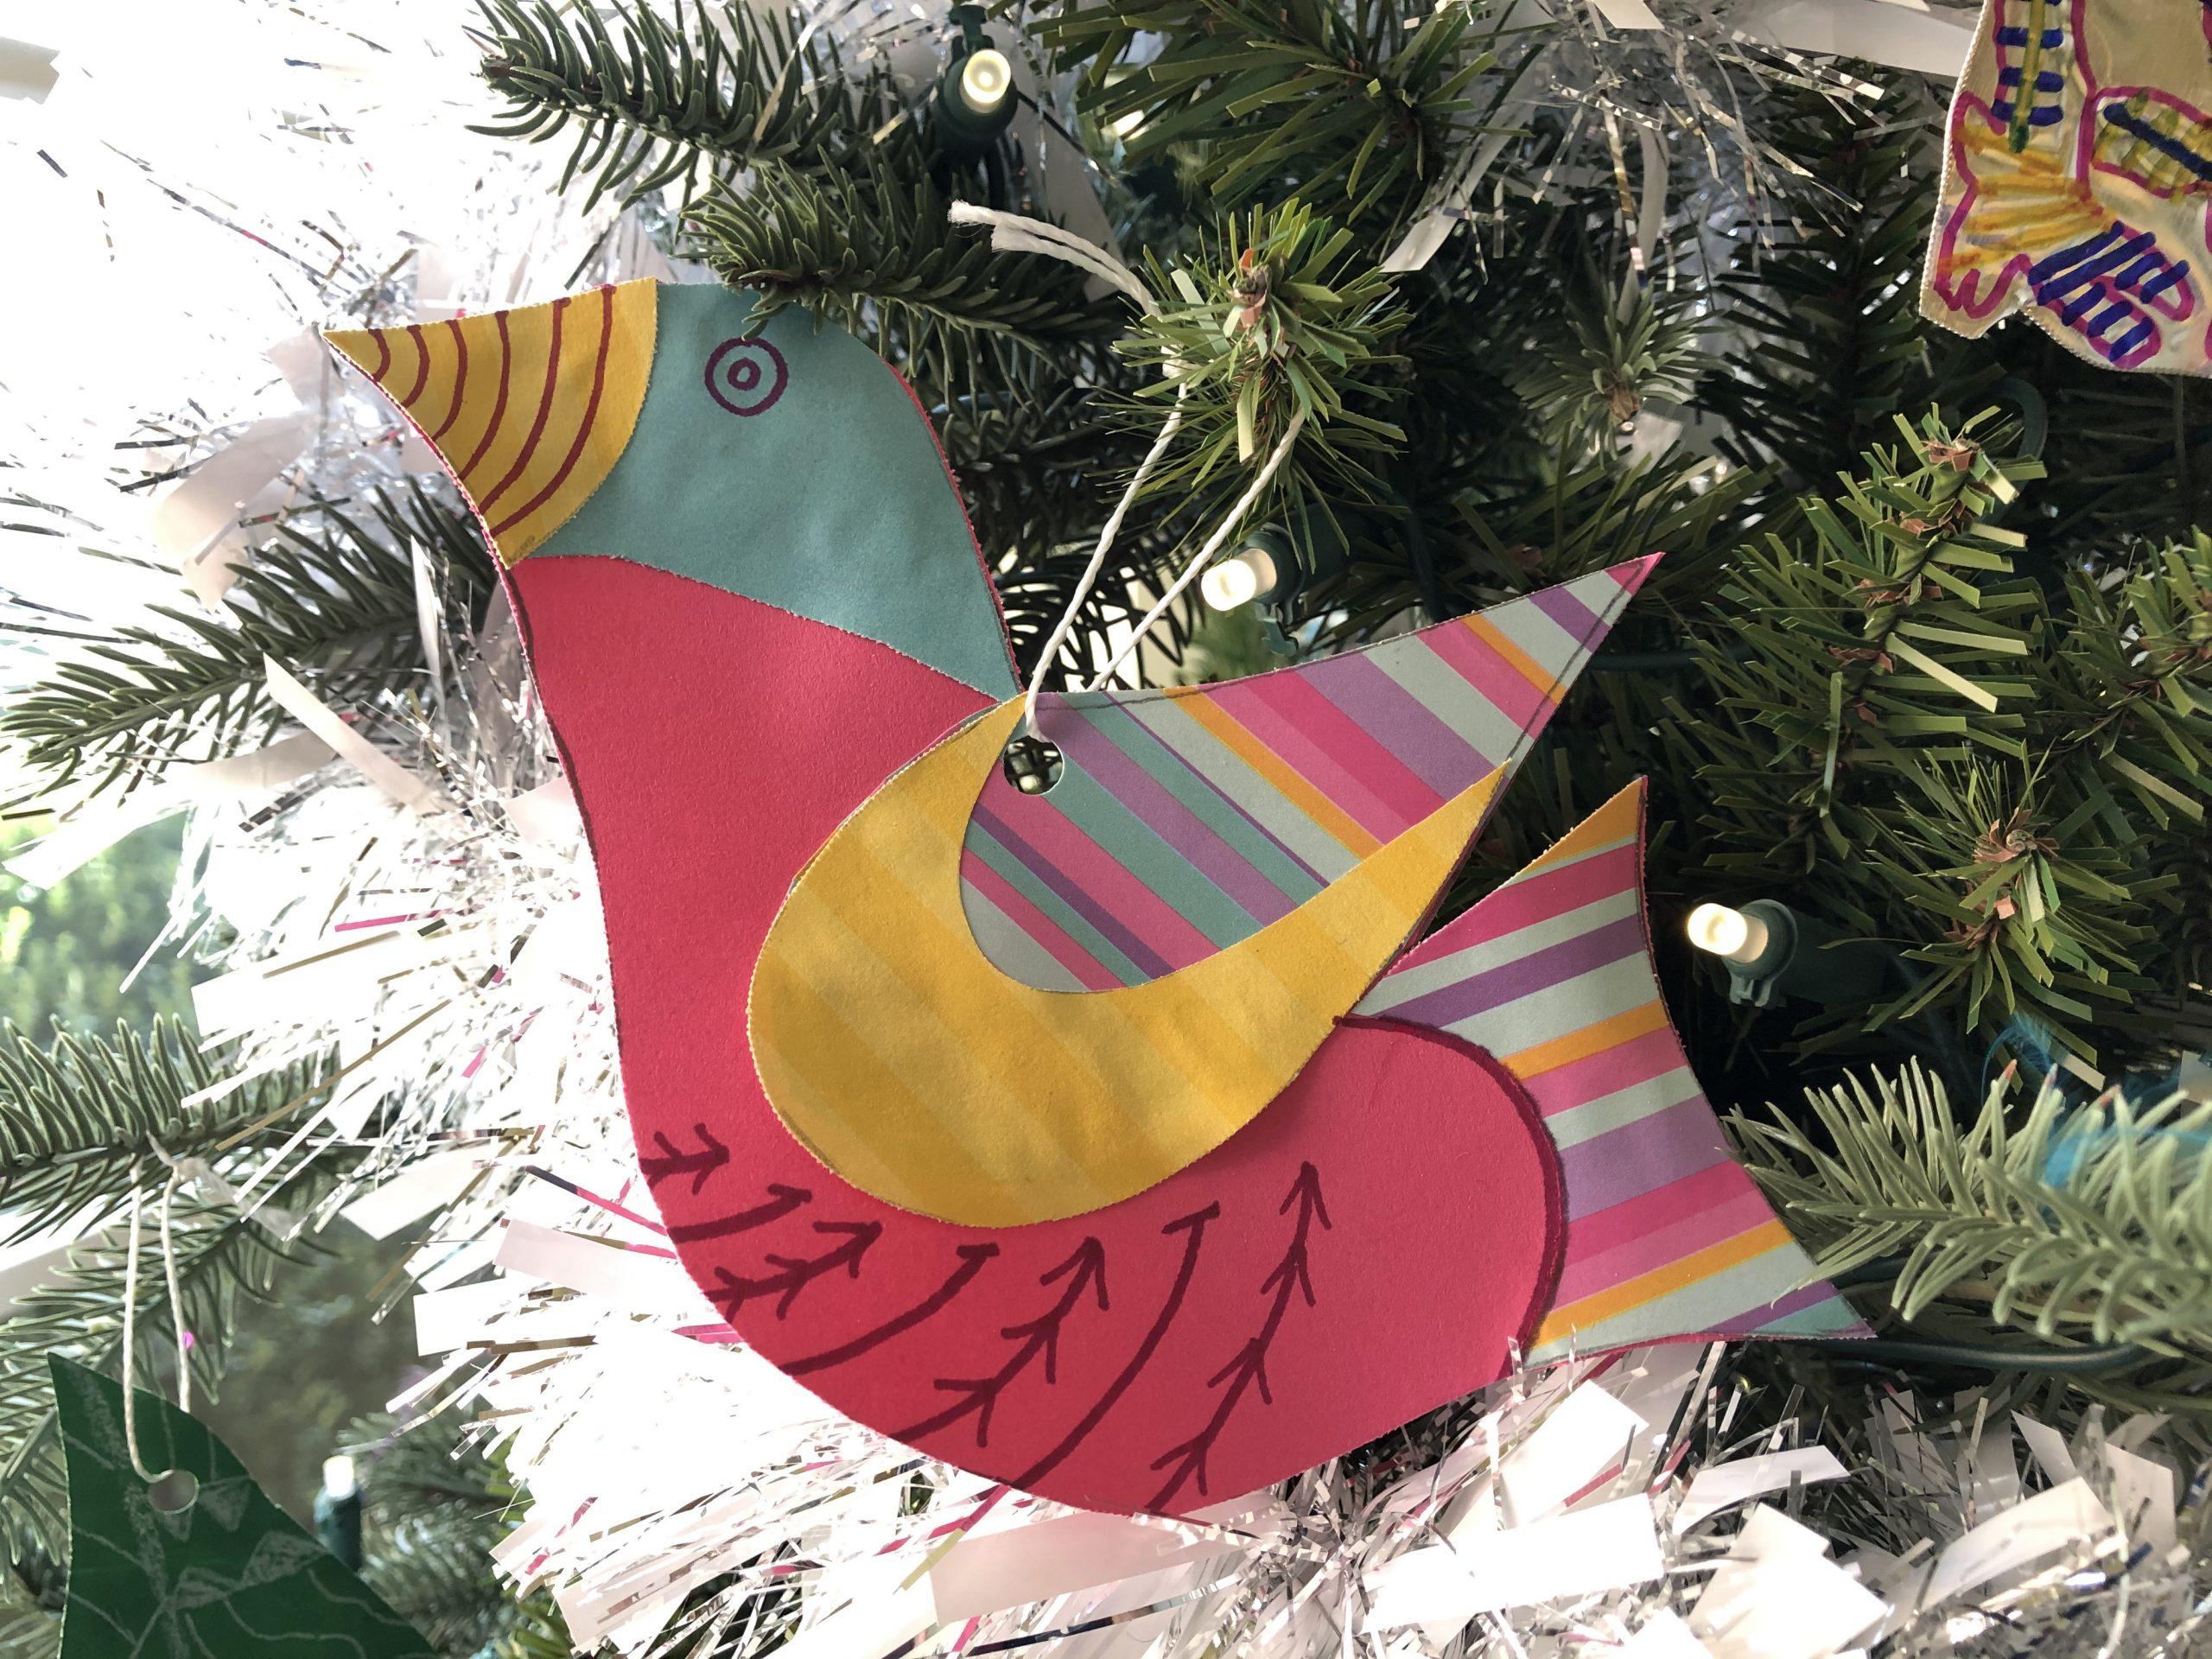 Montrose Elementary School bird decoration